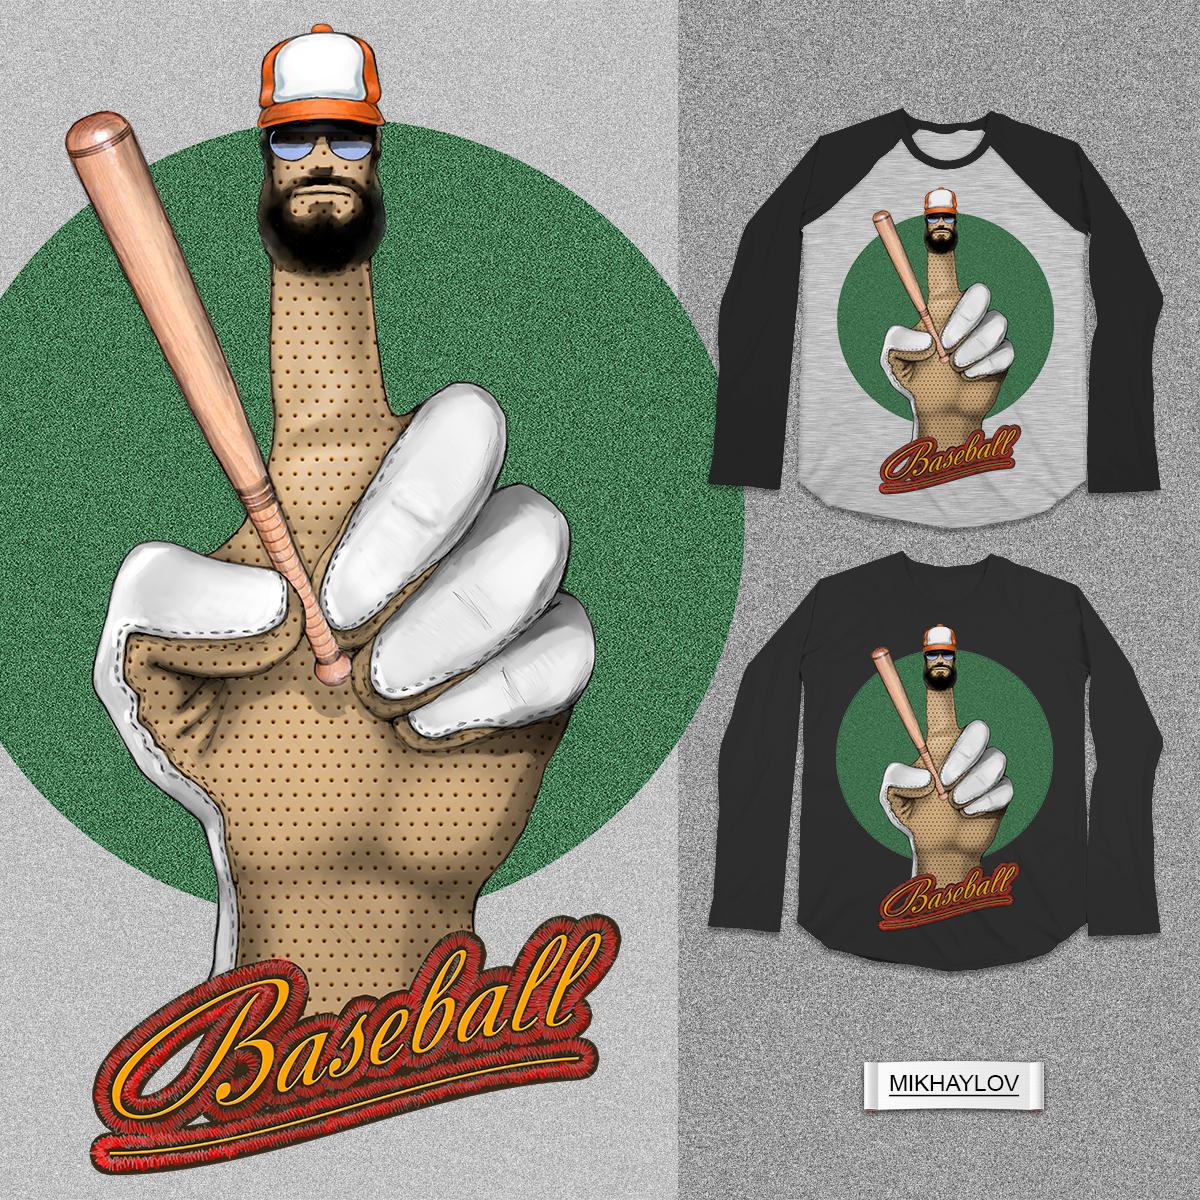 my baseball ! by MIKHAYLOV on Threadless